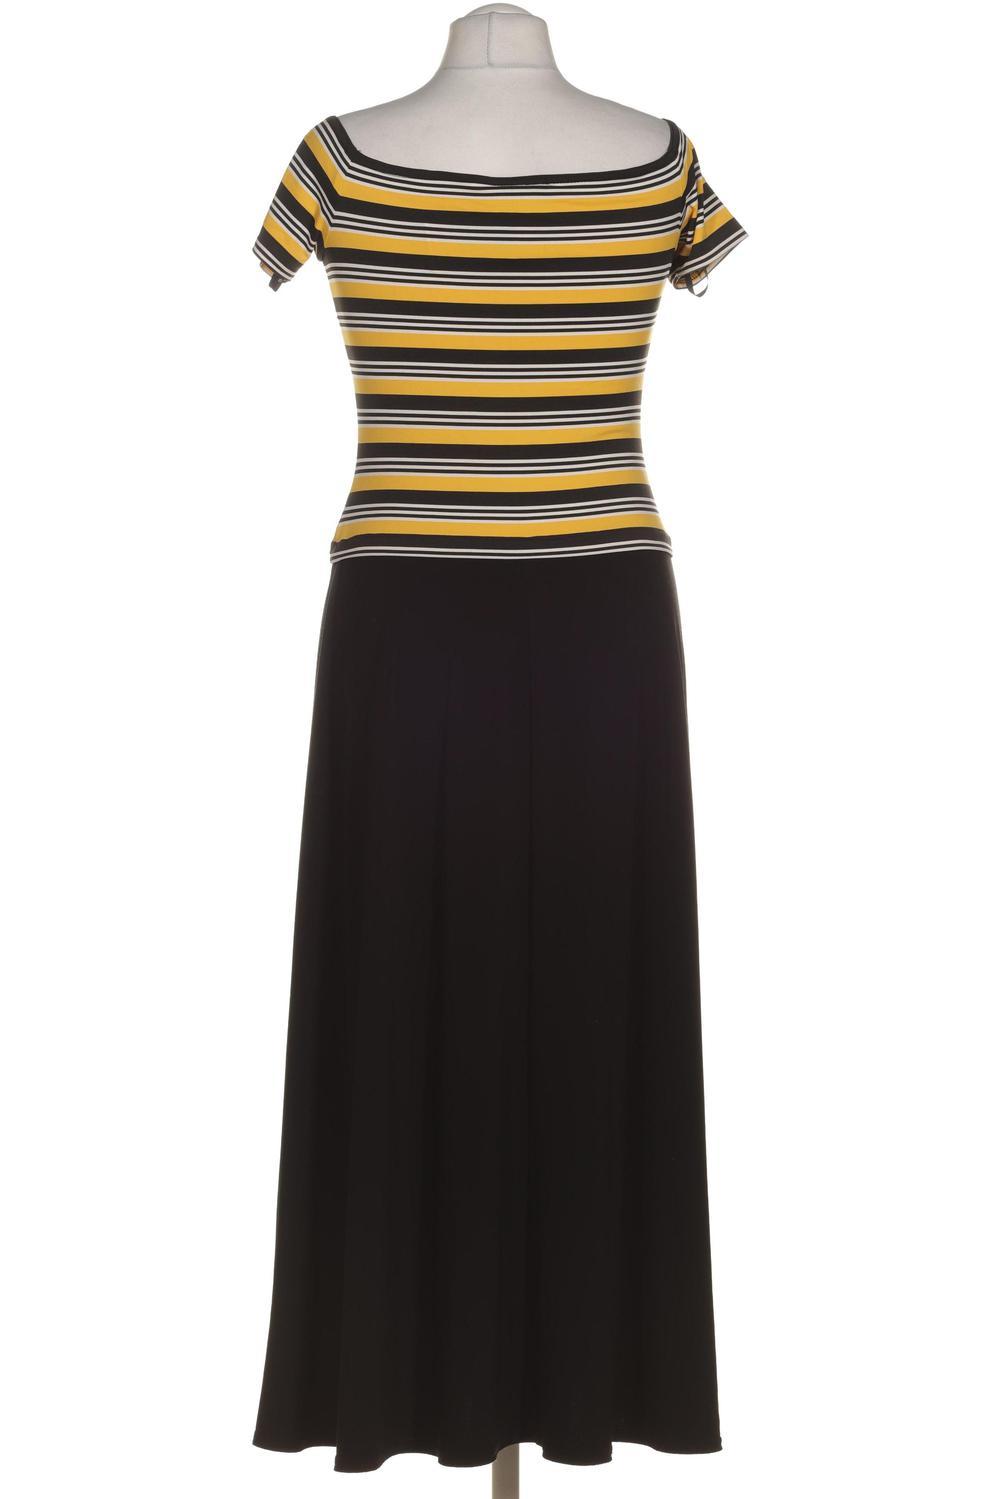 Joseph Ribkoff Damen Kleid DE 40 Second Hand kaufen | ubup